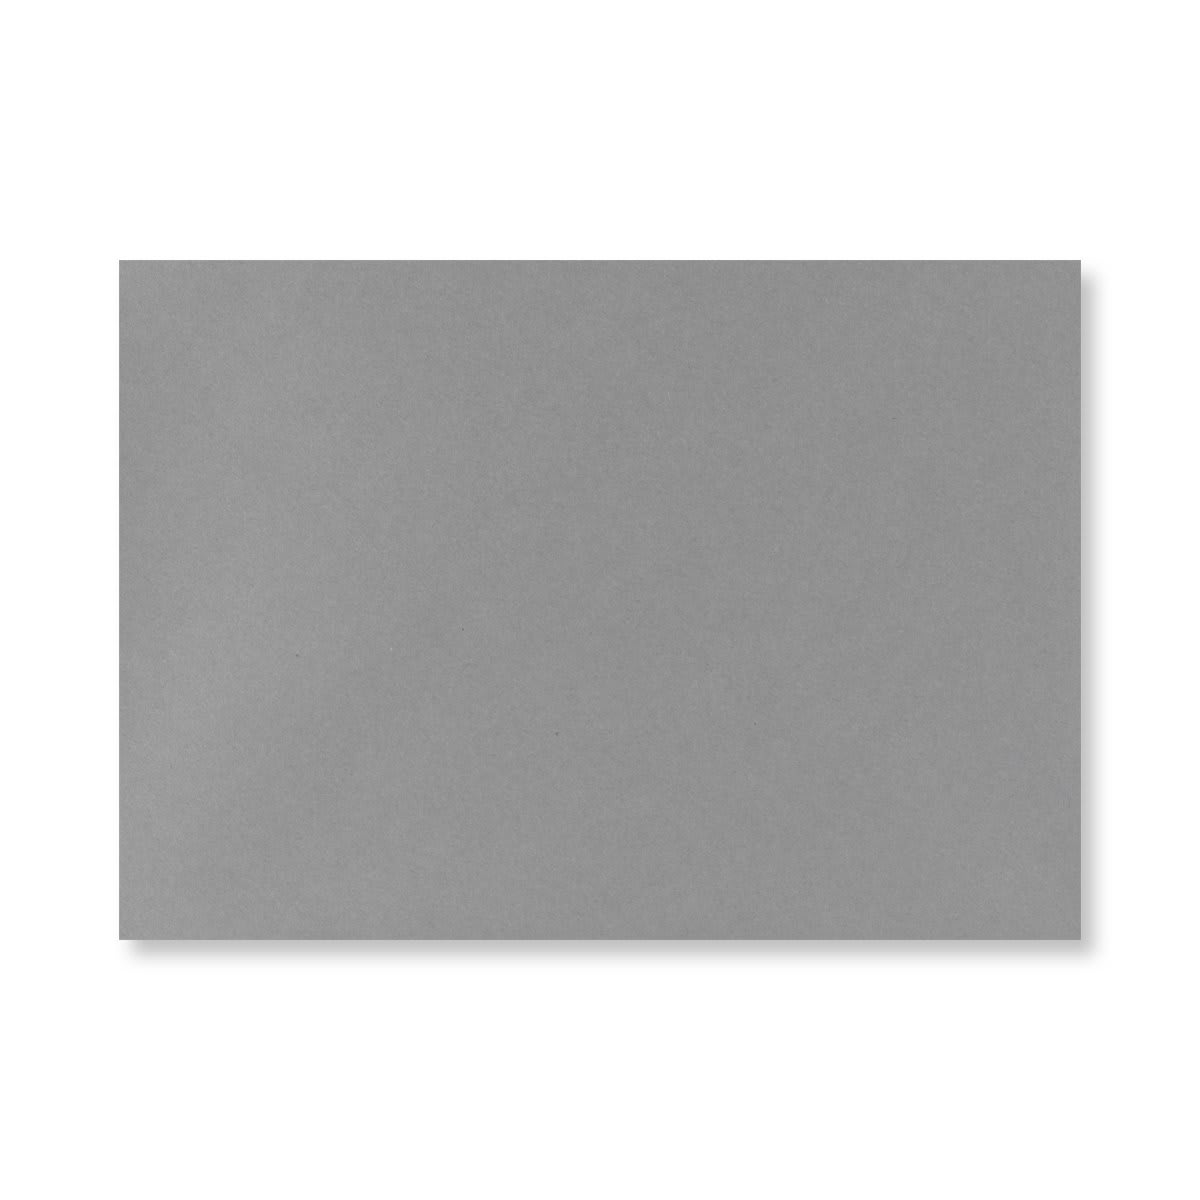 WAGTAIL GREY 133 x 184mm ENVELOPES 120GSM (i8)